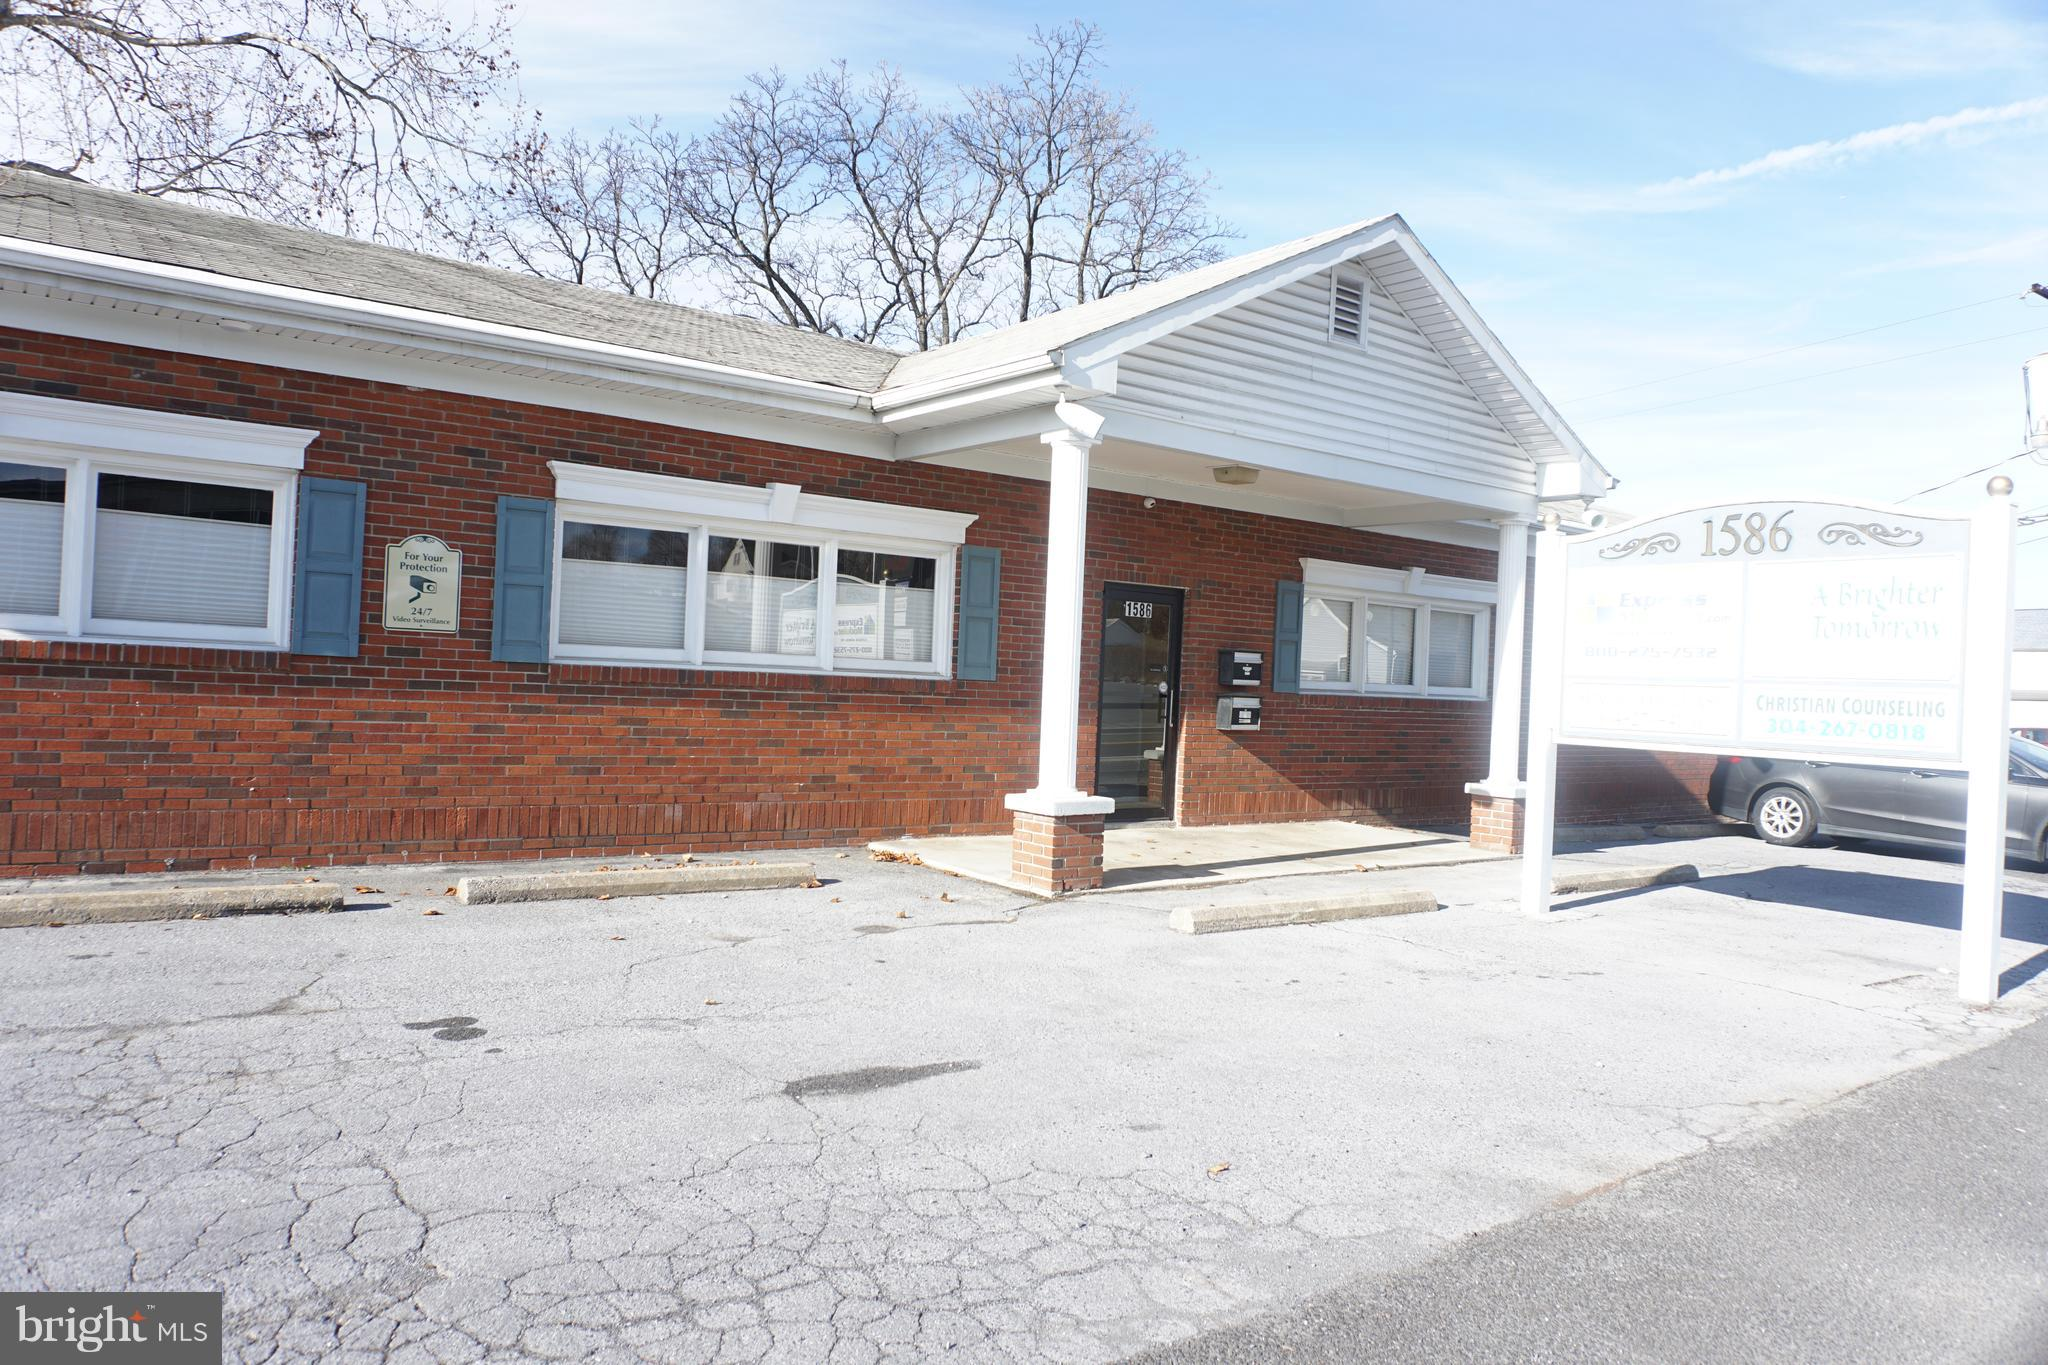 1586 WINCHESTER AVE, Martinsburg, WV 25405 $395 www mattridgeway com